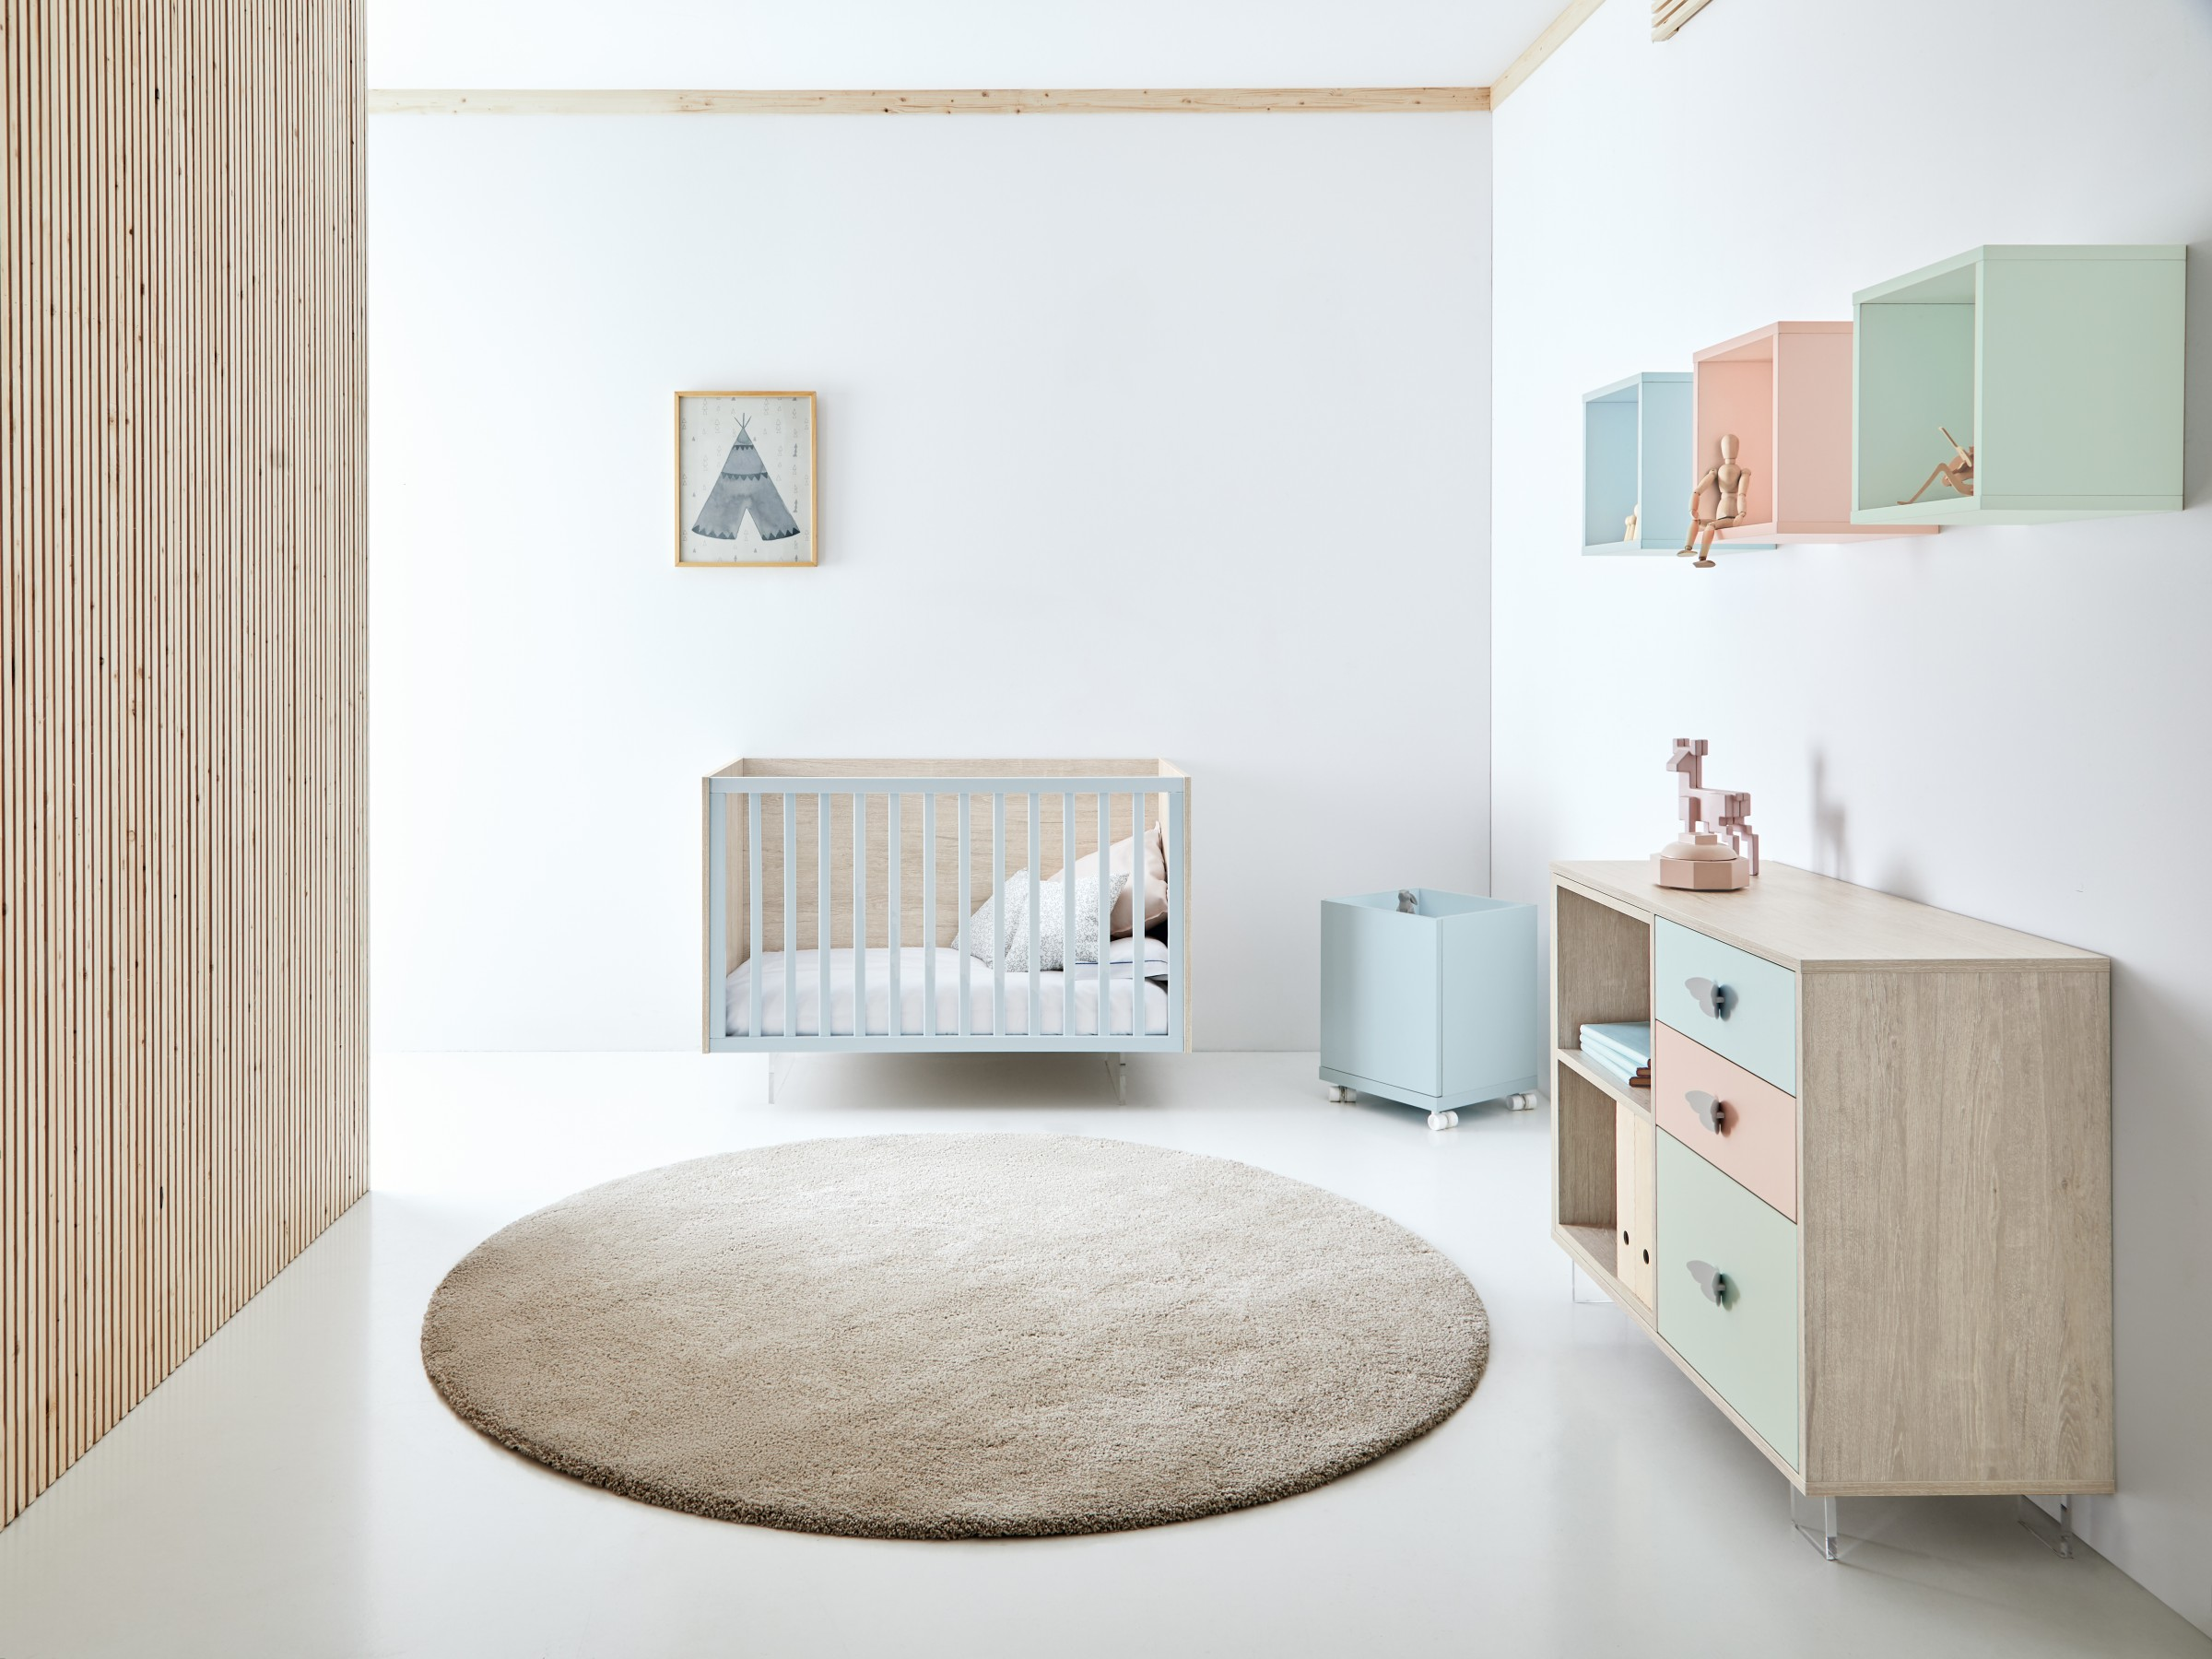 Habitacion infantil Dormitorio infantil Muebles Orts 968